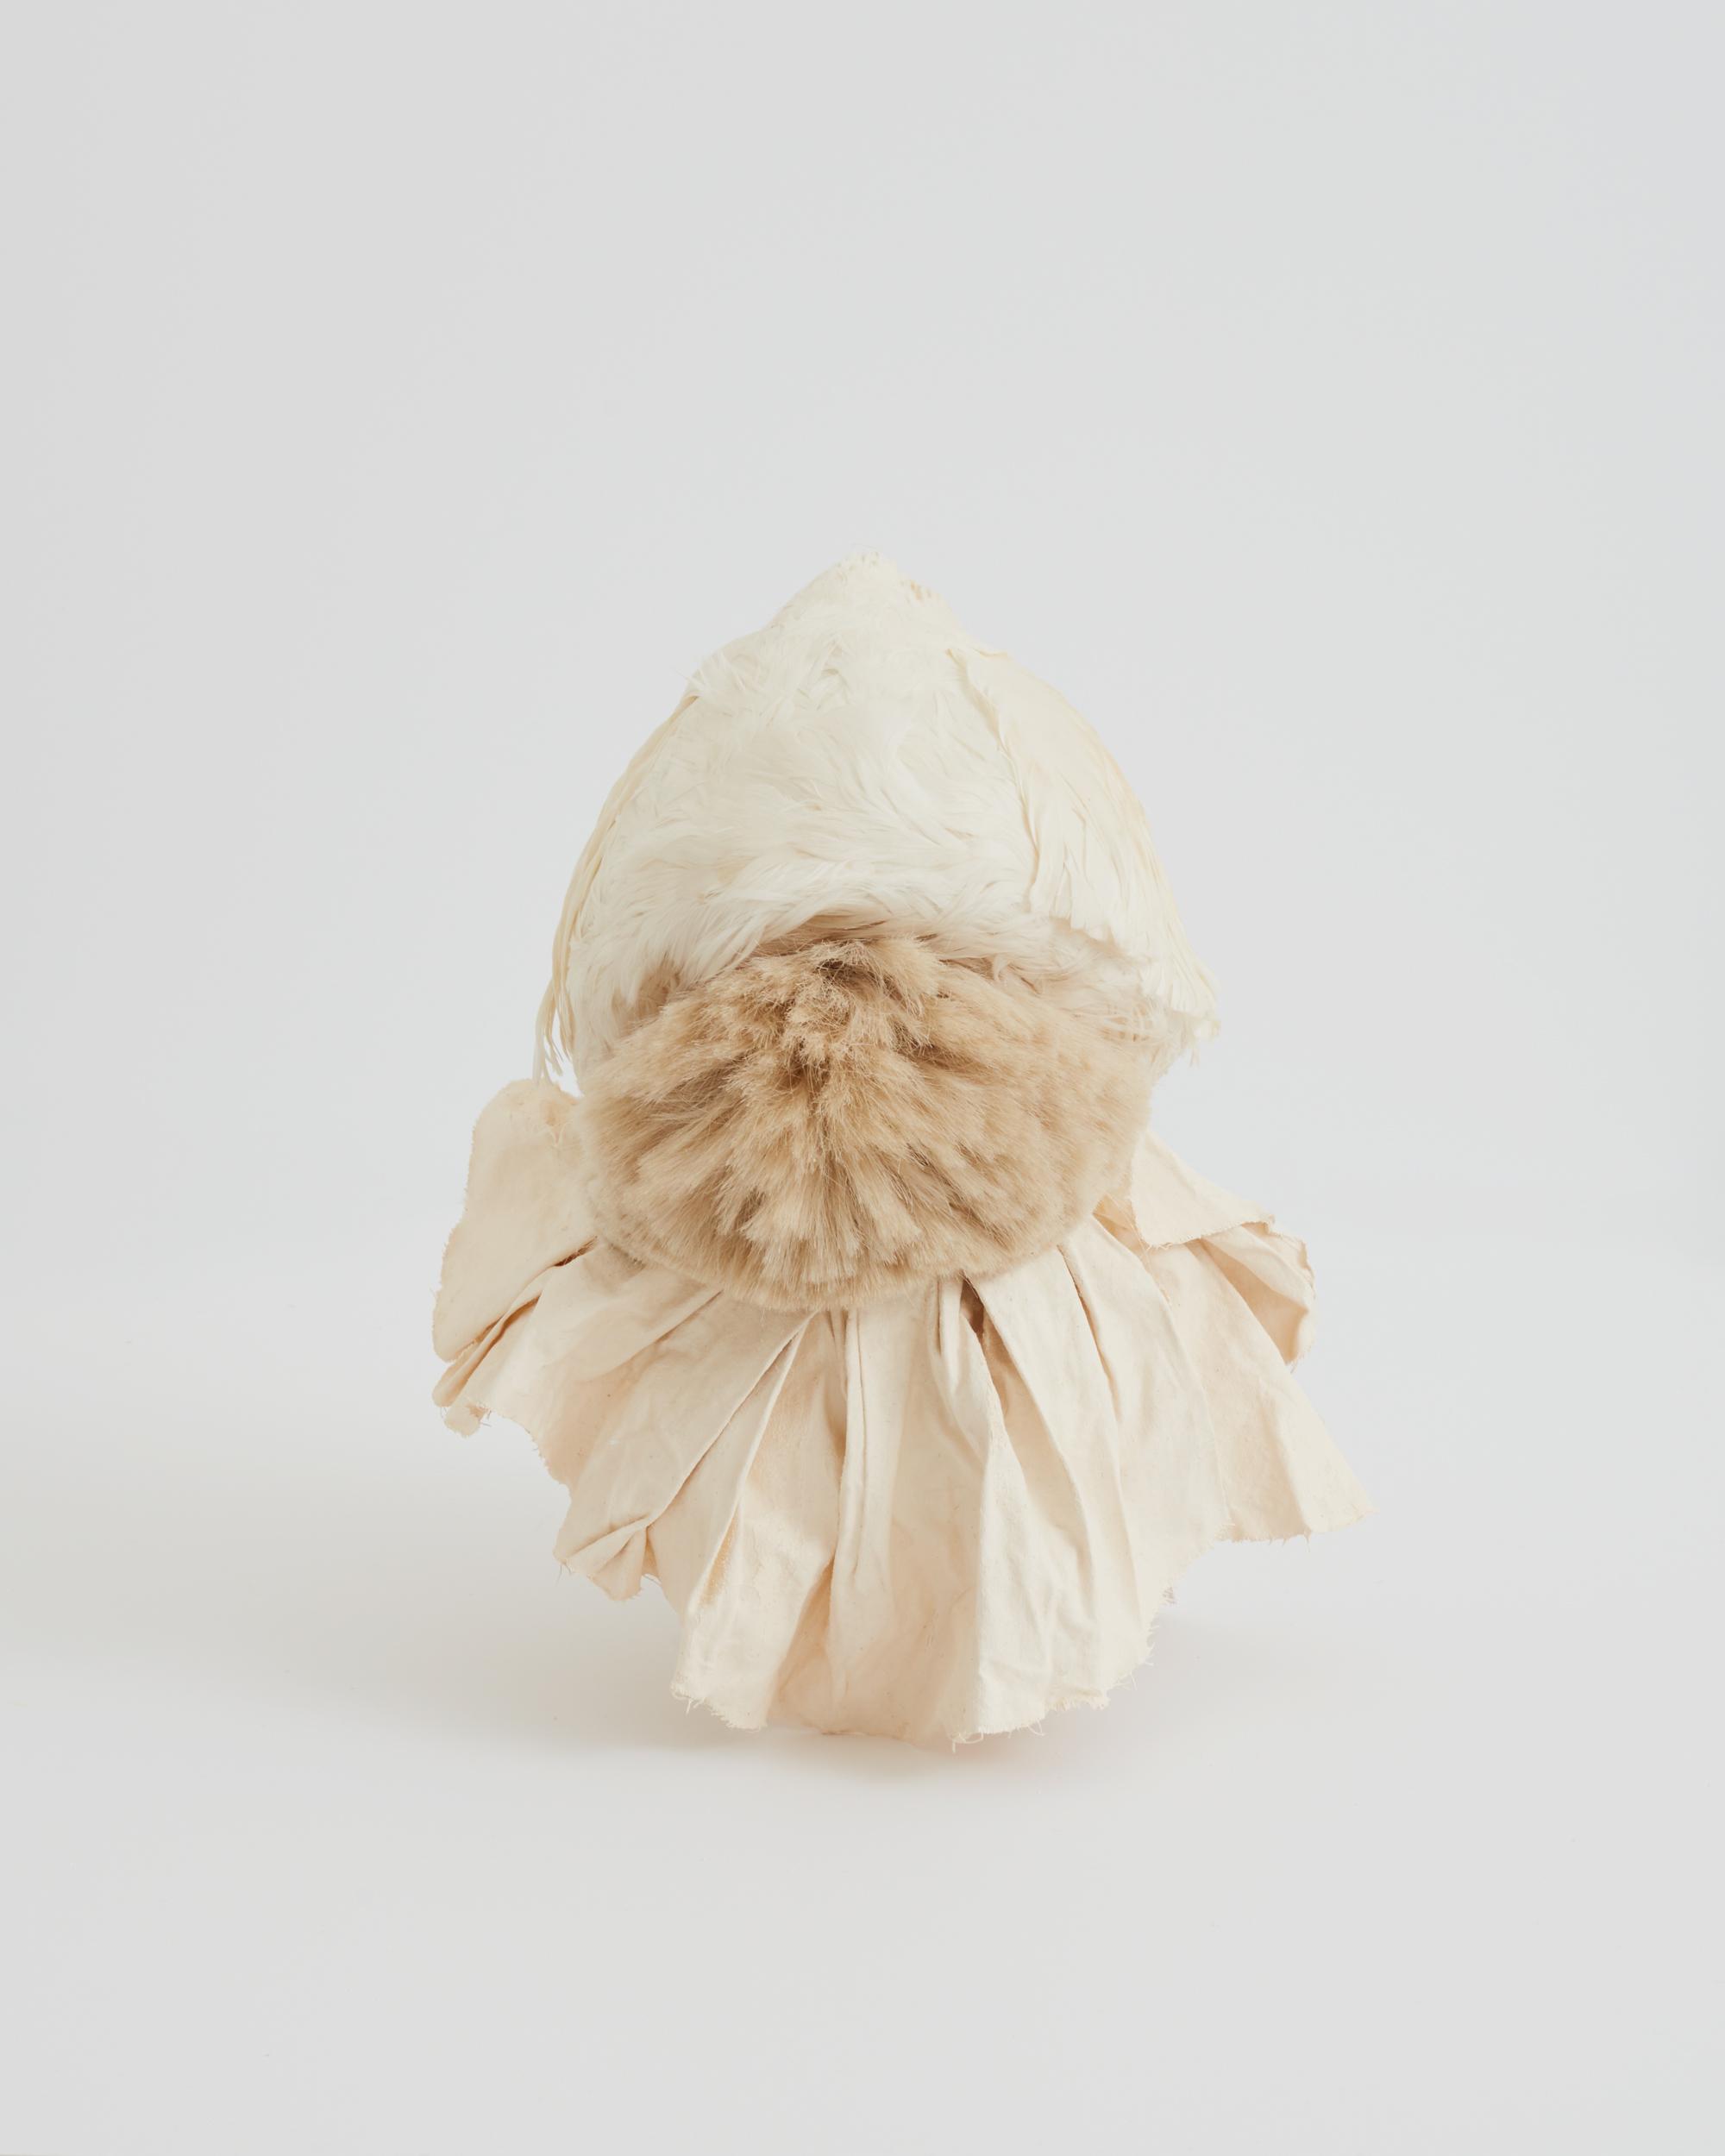 Maryam Keyhani_Swan Feather Hat_swan feather, canvas, paint, hand-made brush_25x28x33cm.JPG